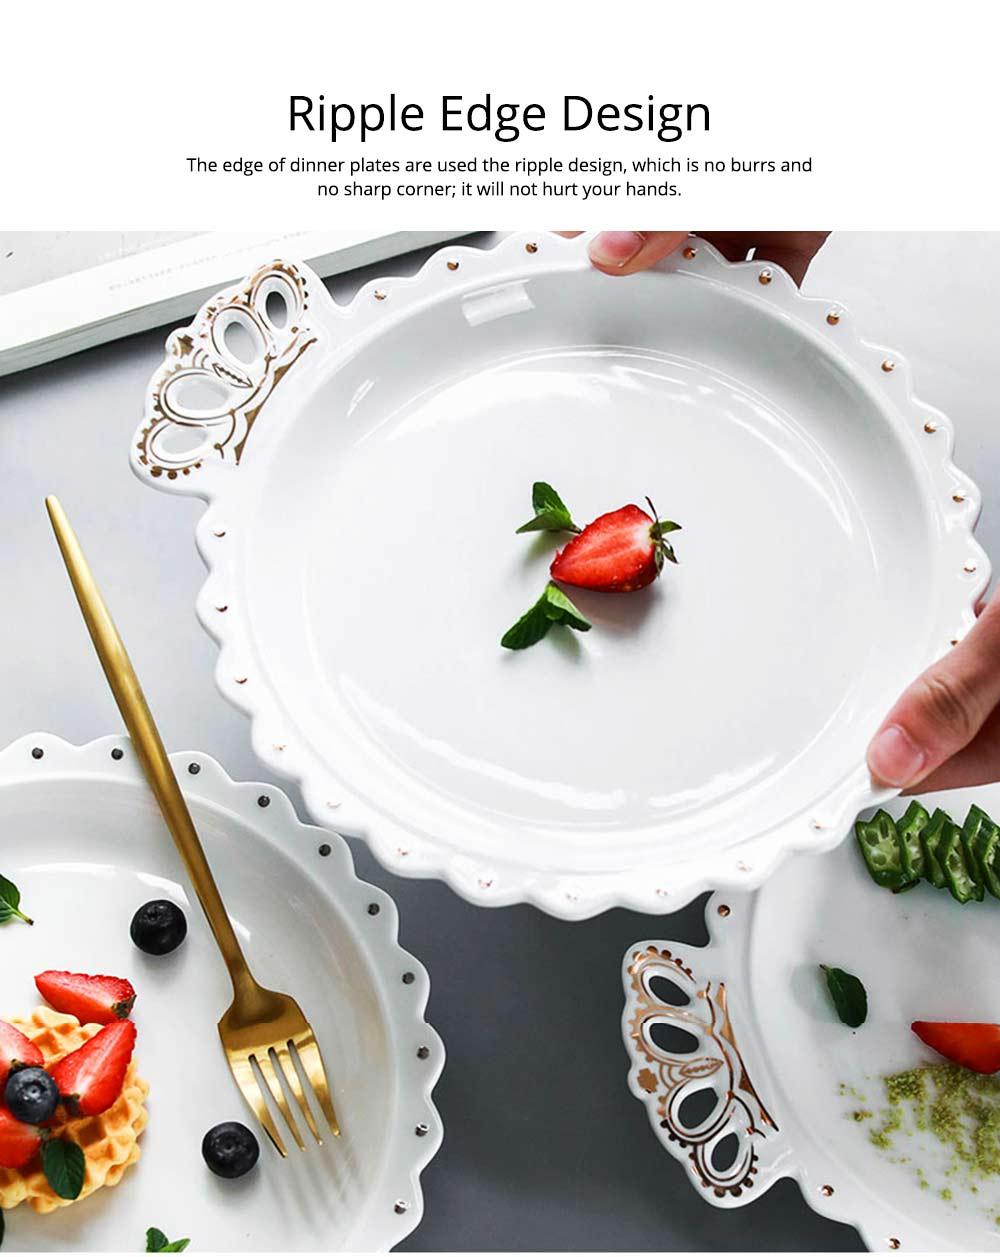 Crown Dinner Plates 10 inches, Porcelain Ceramic Breakfast Tray Steak Plate 13